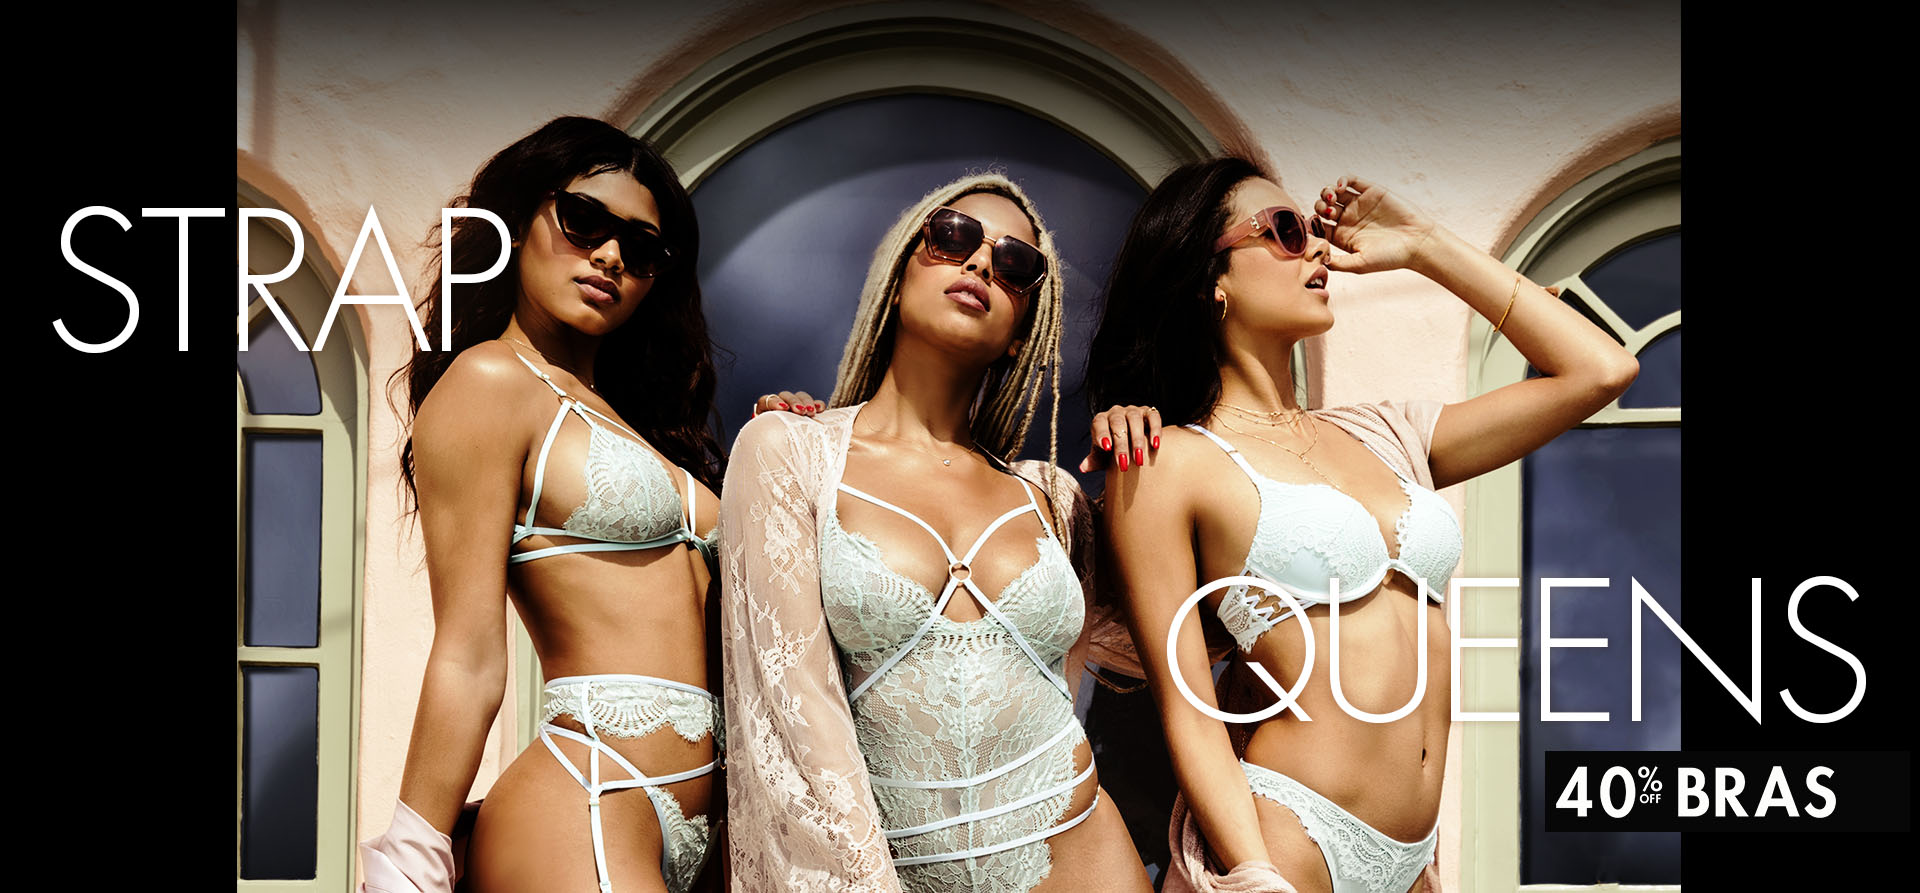 67df2262c2 Strap queens. 40% off bras. Shop now